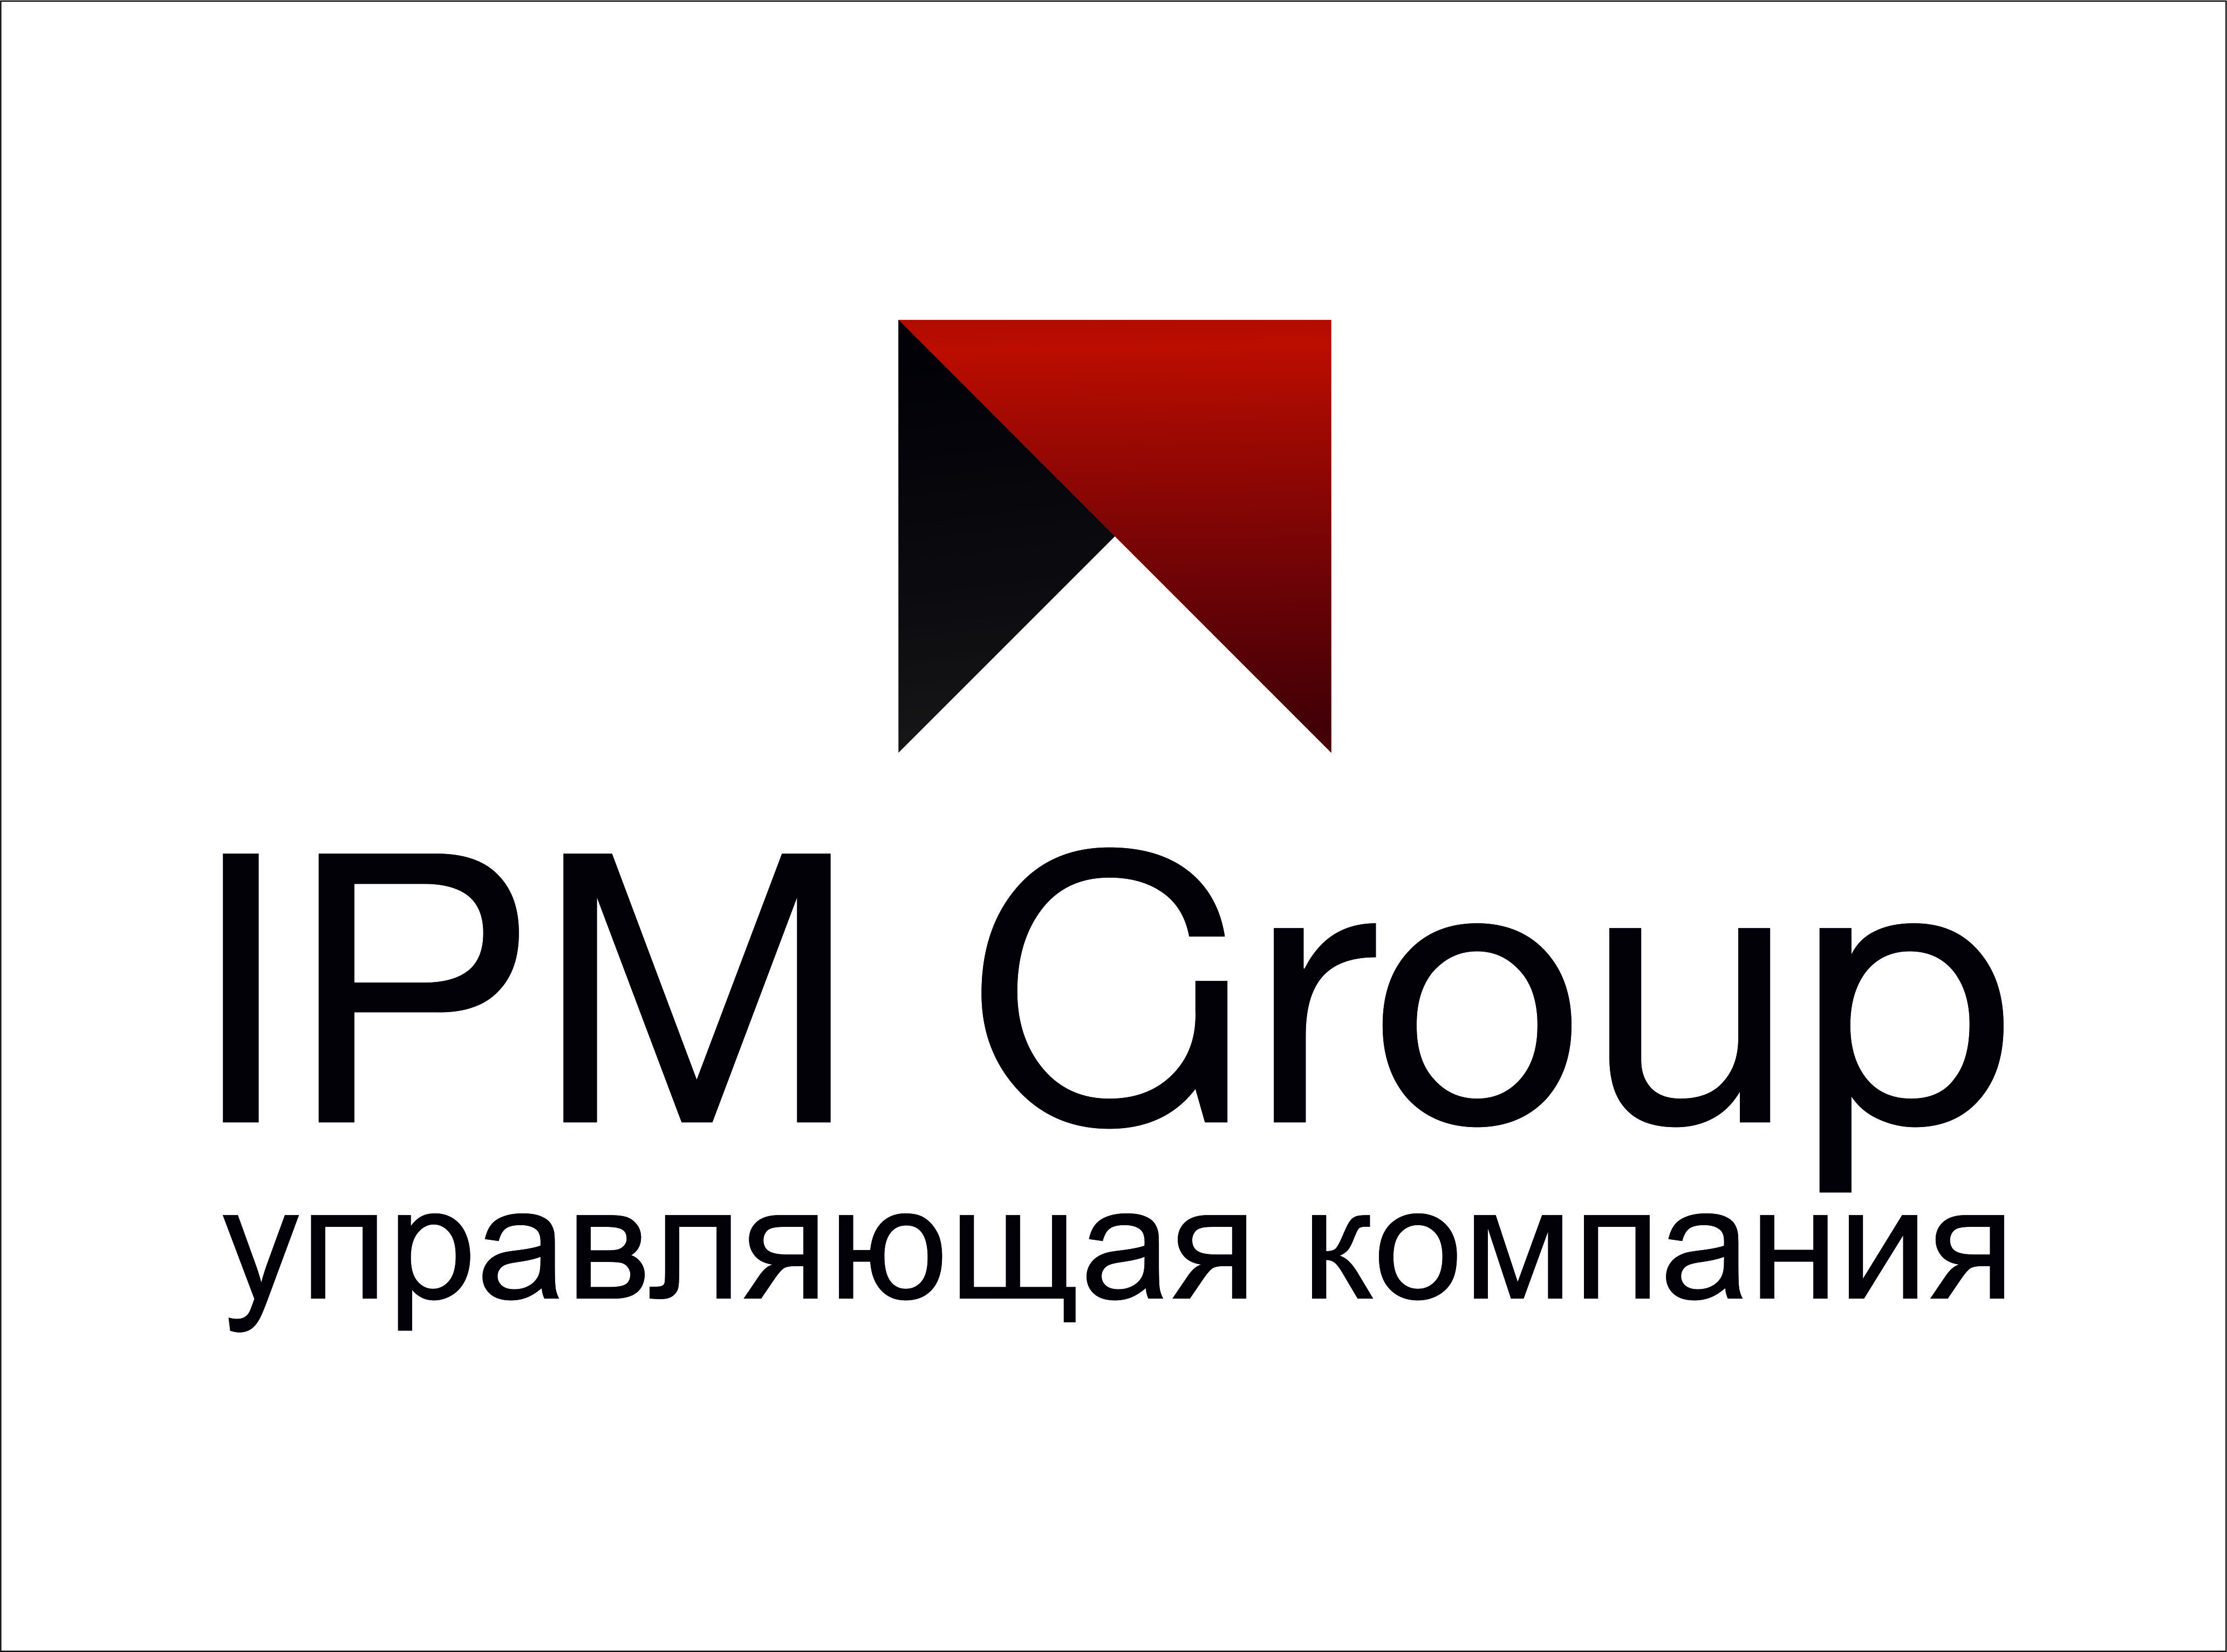 Разработка логотипа для управляющей компании фото f_0155f8411656d3f6.jpg